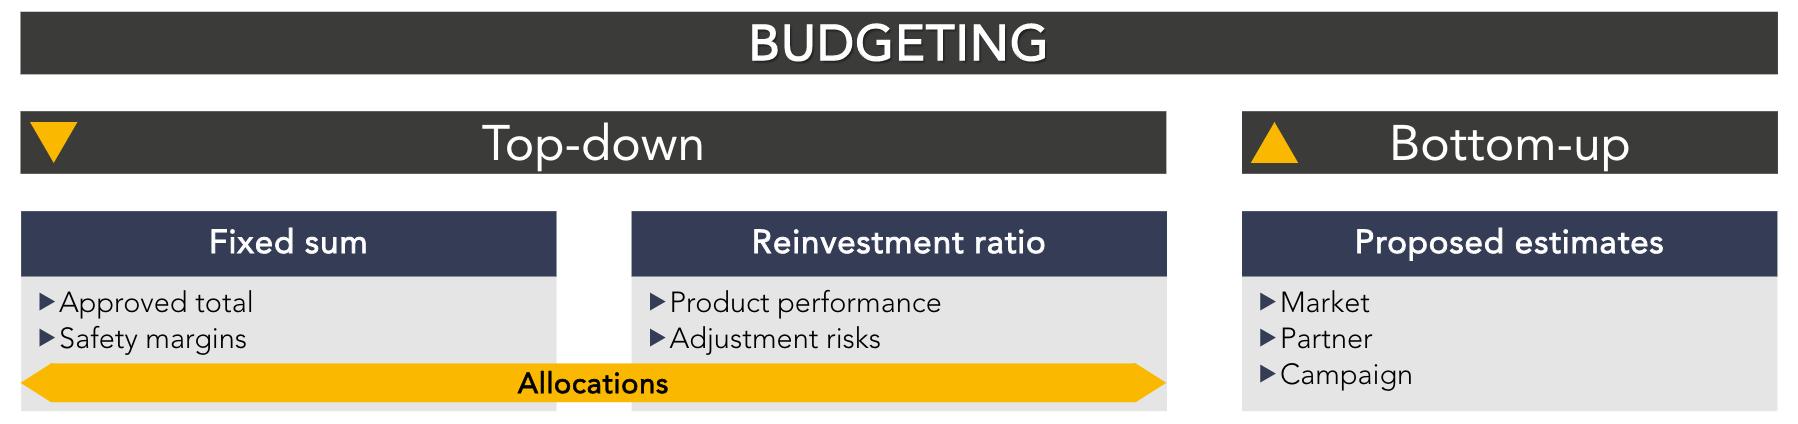 ua budgeting practices